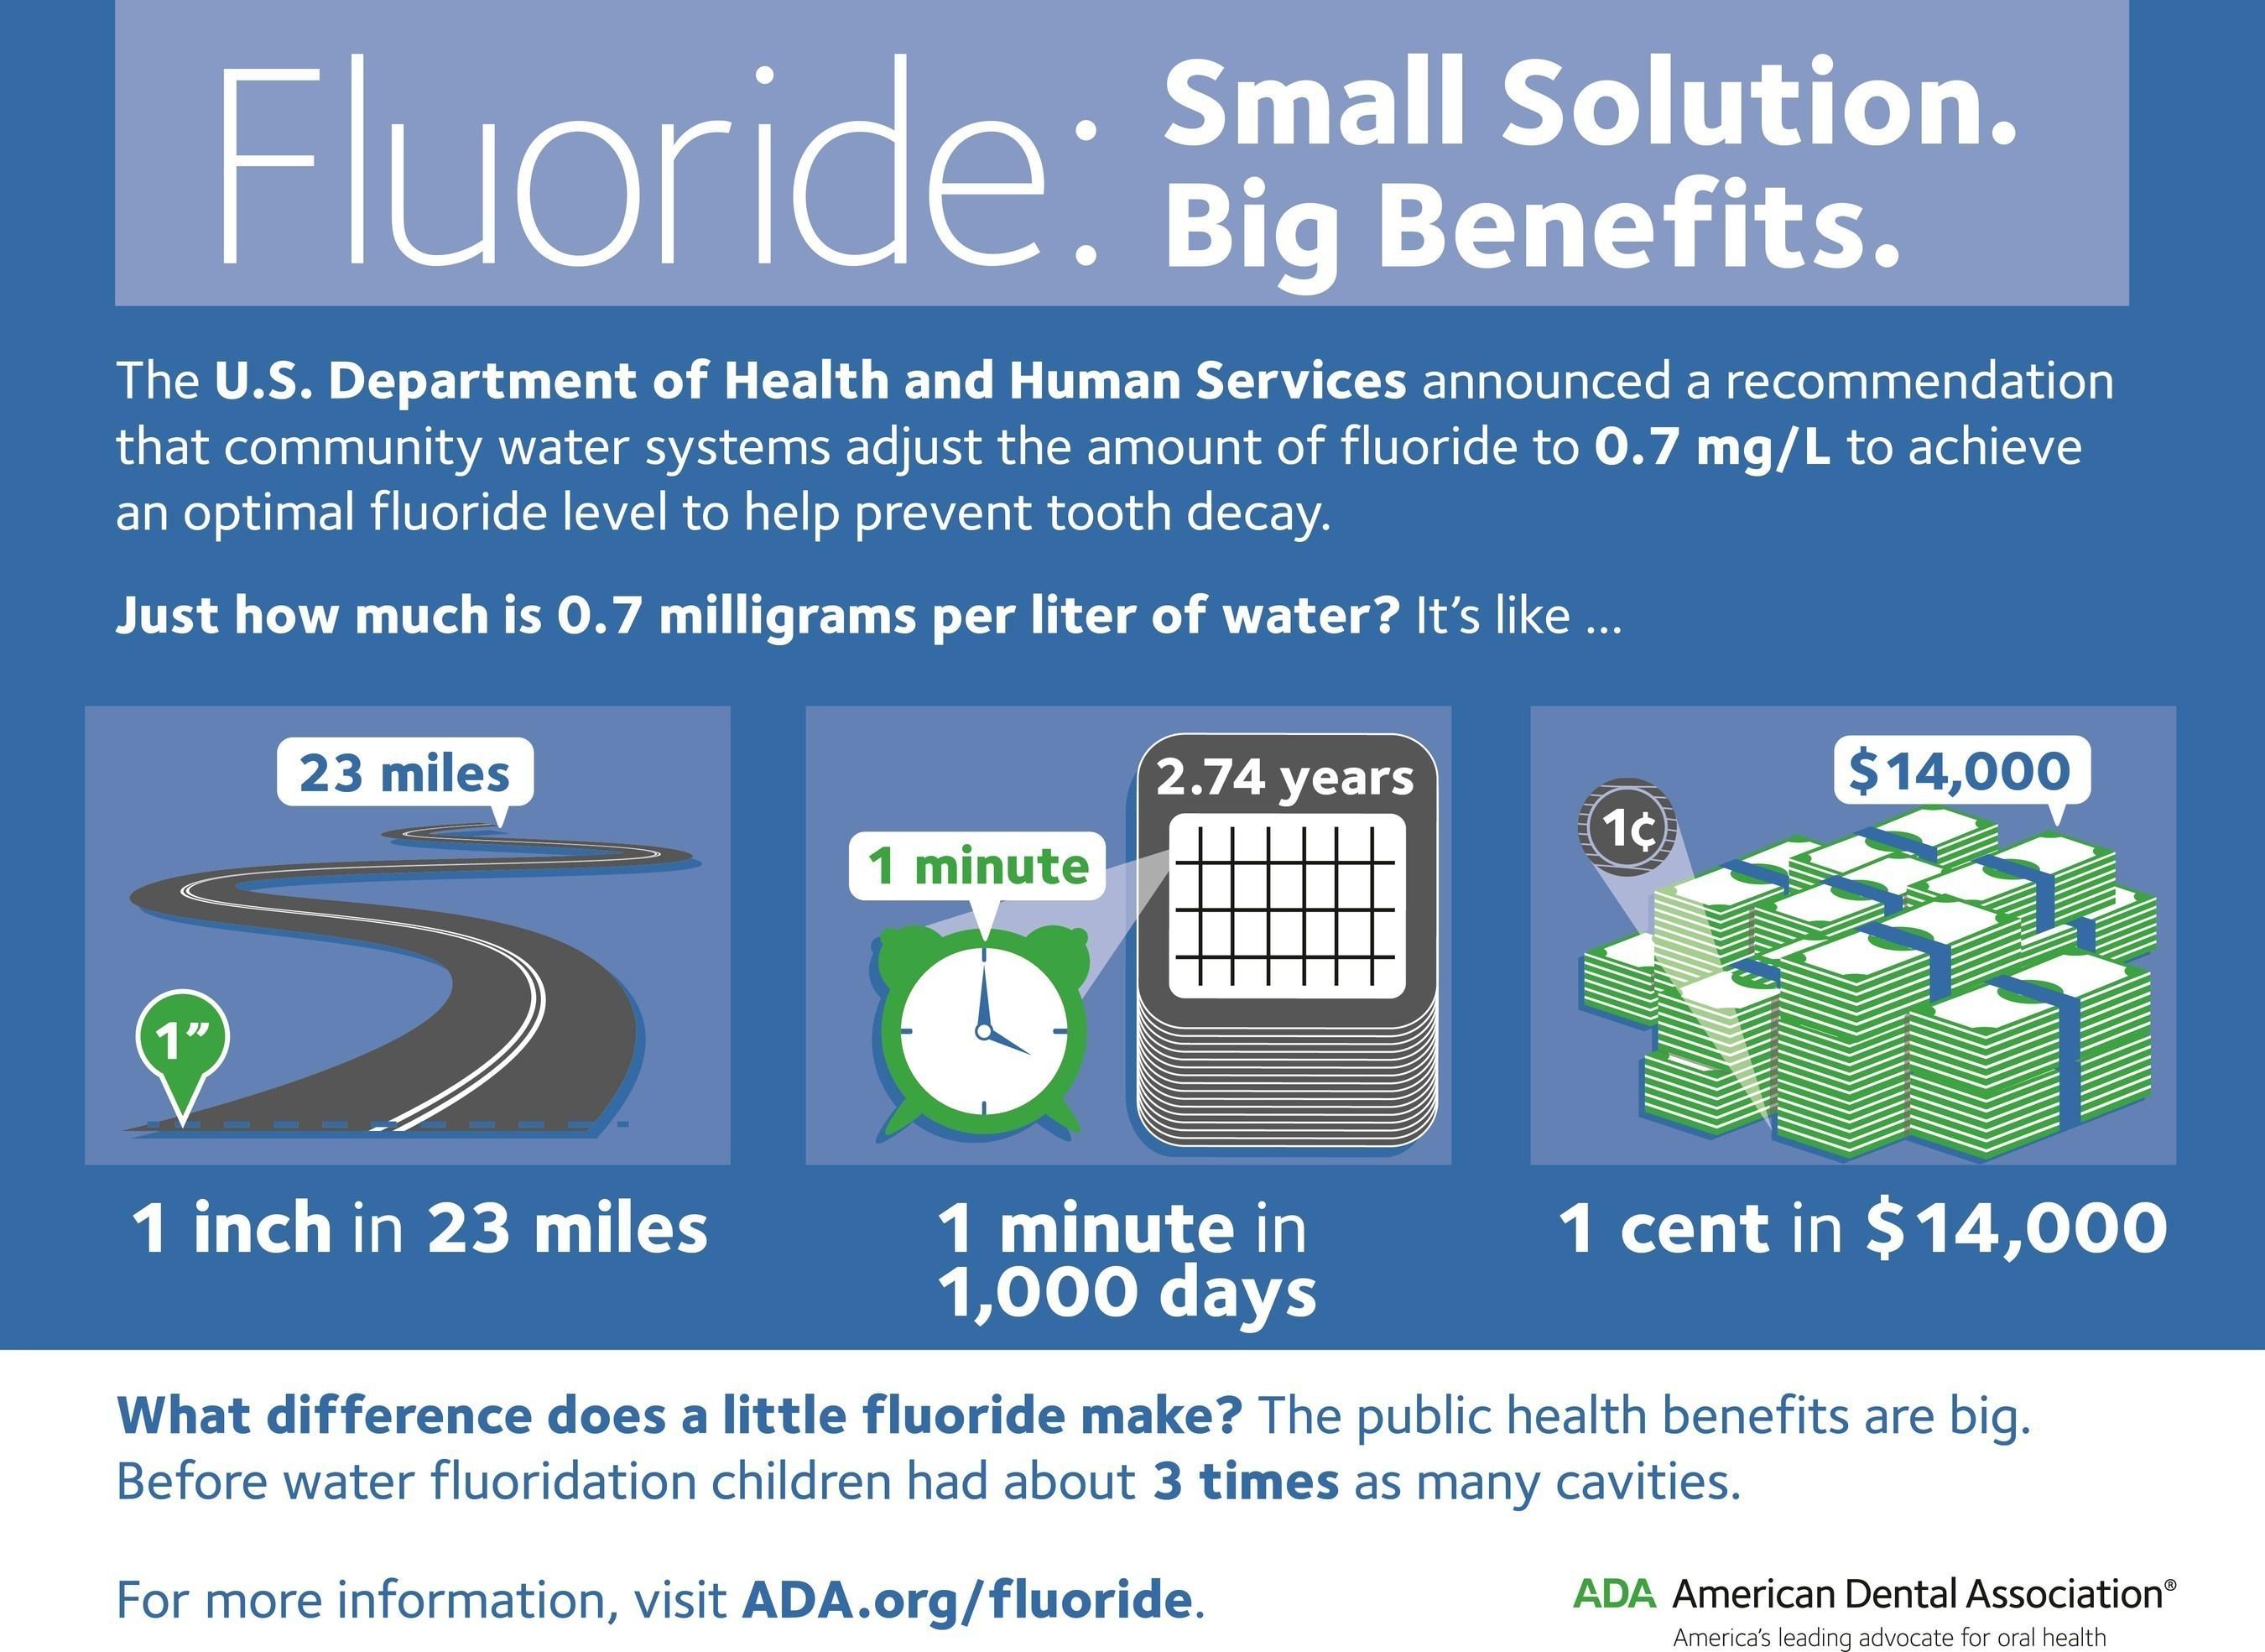 Fluoride: Small Solution, Big Benefits